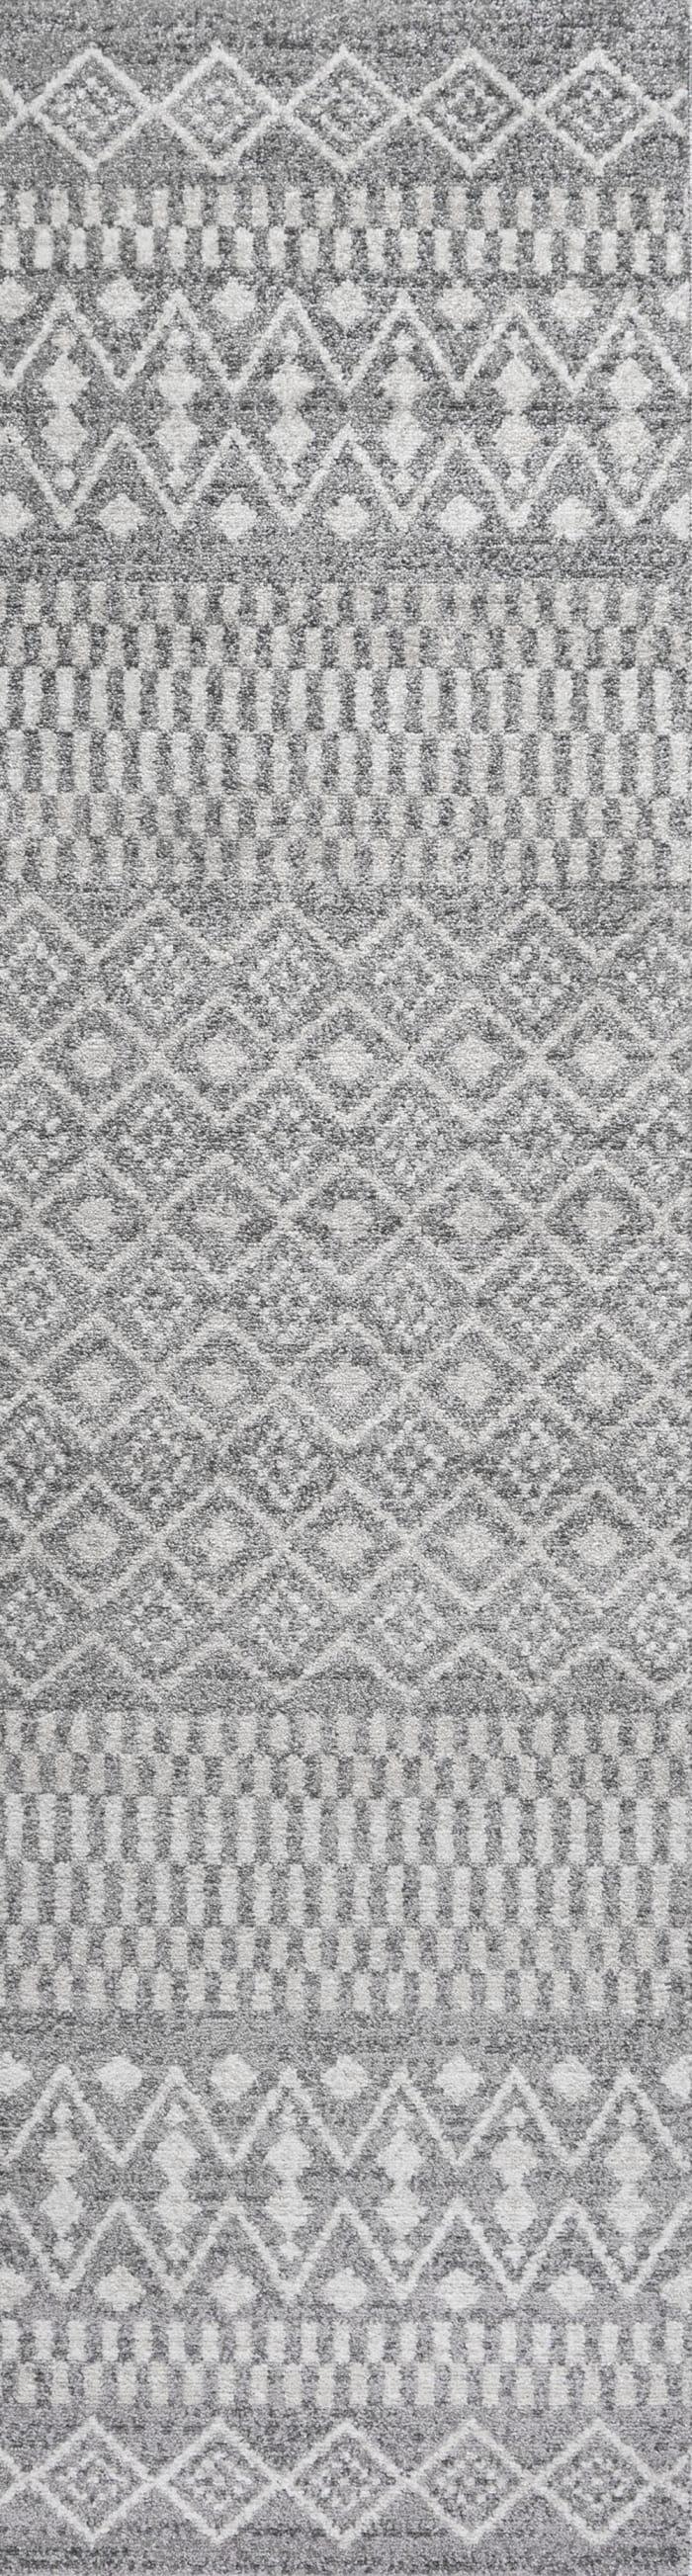 Berber Geometric Stripe Gray/Cream 2' x 8' Runner Rug